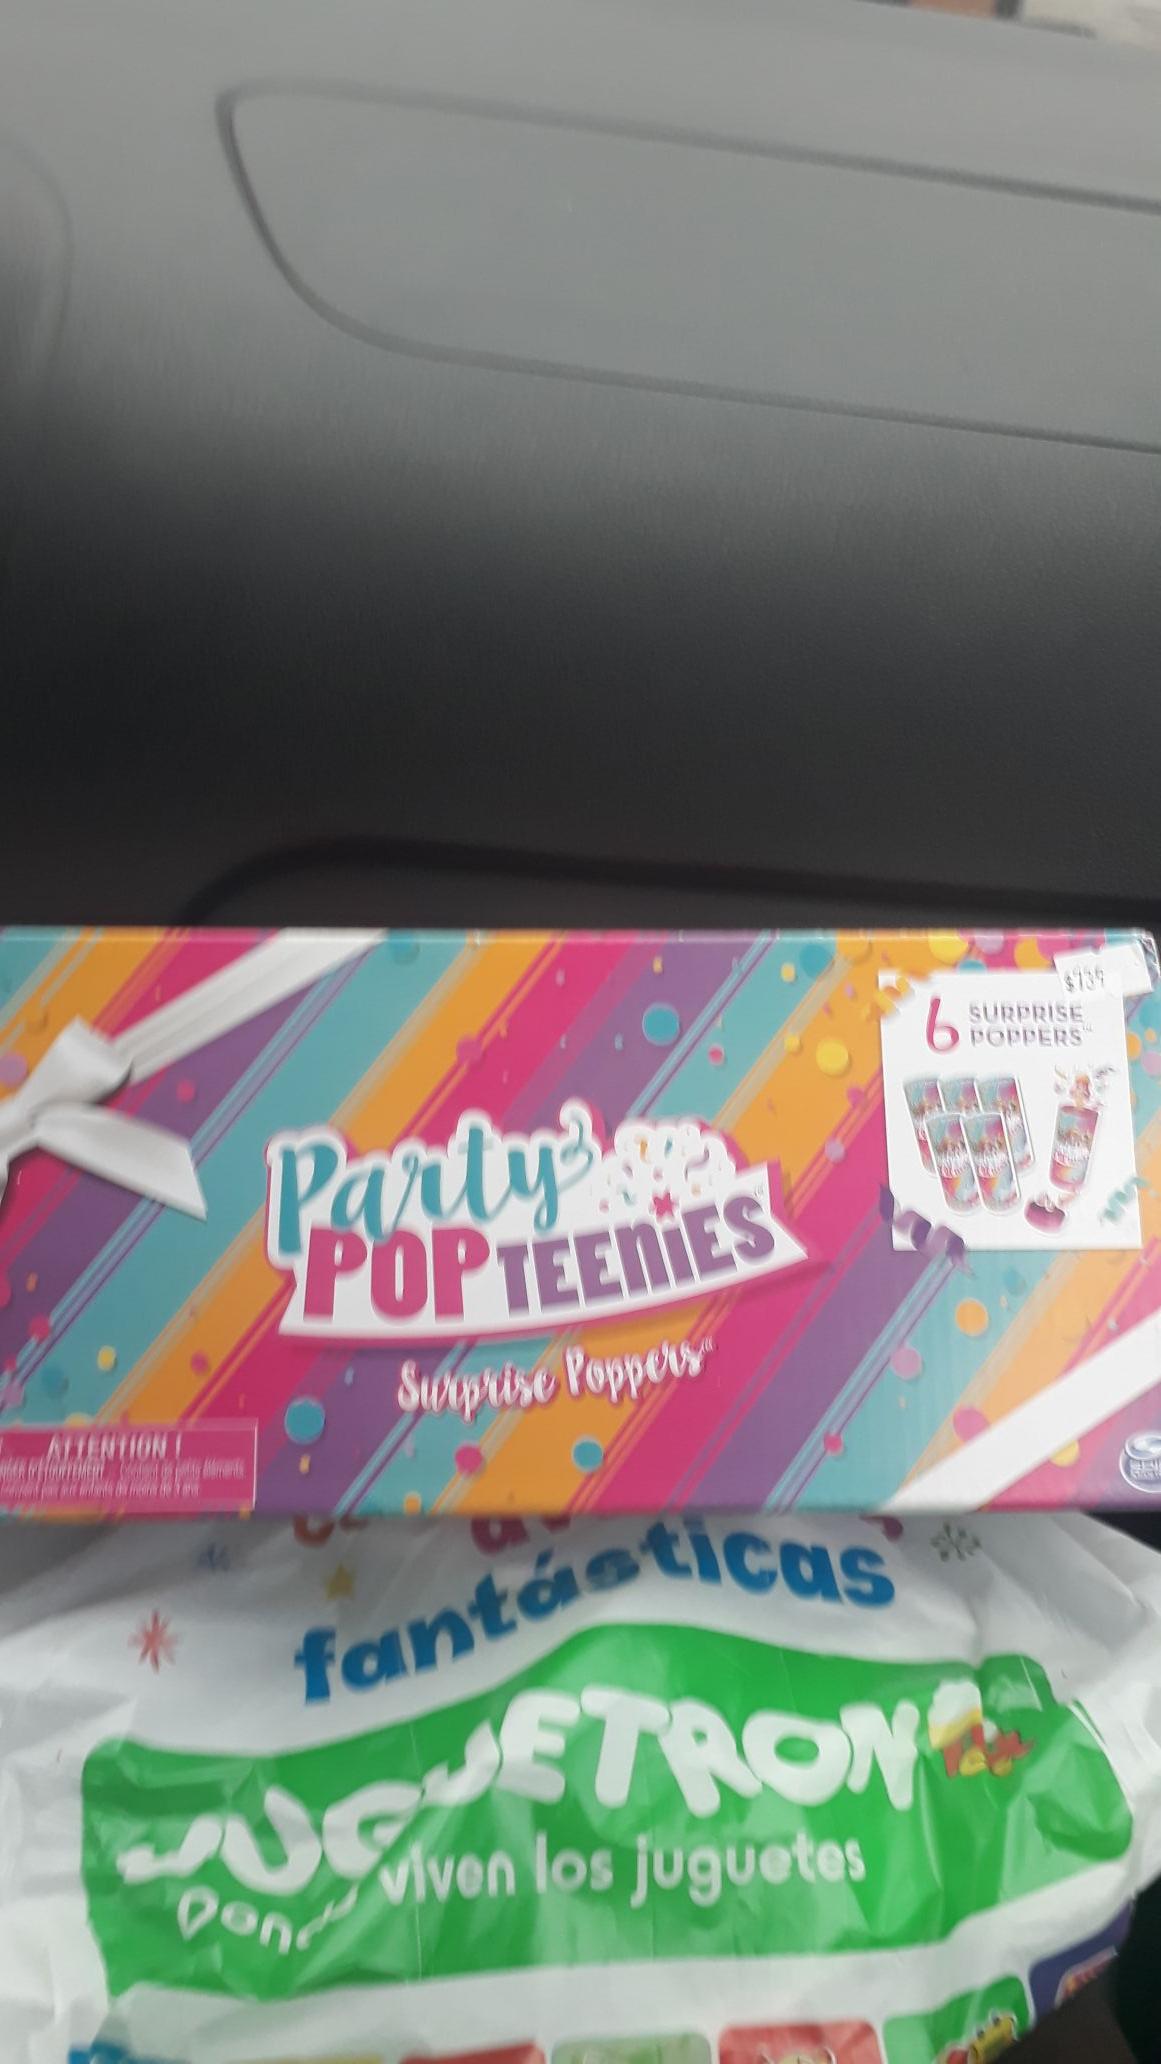 Juguetron: paquete de 6 partty pop teenies c/u $37